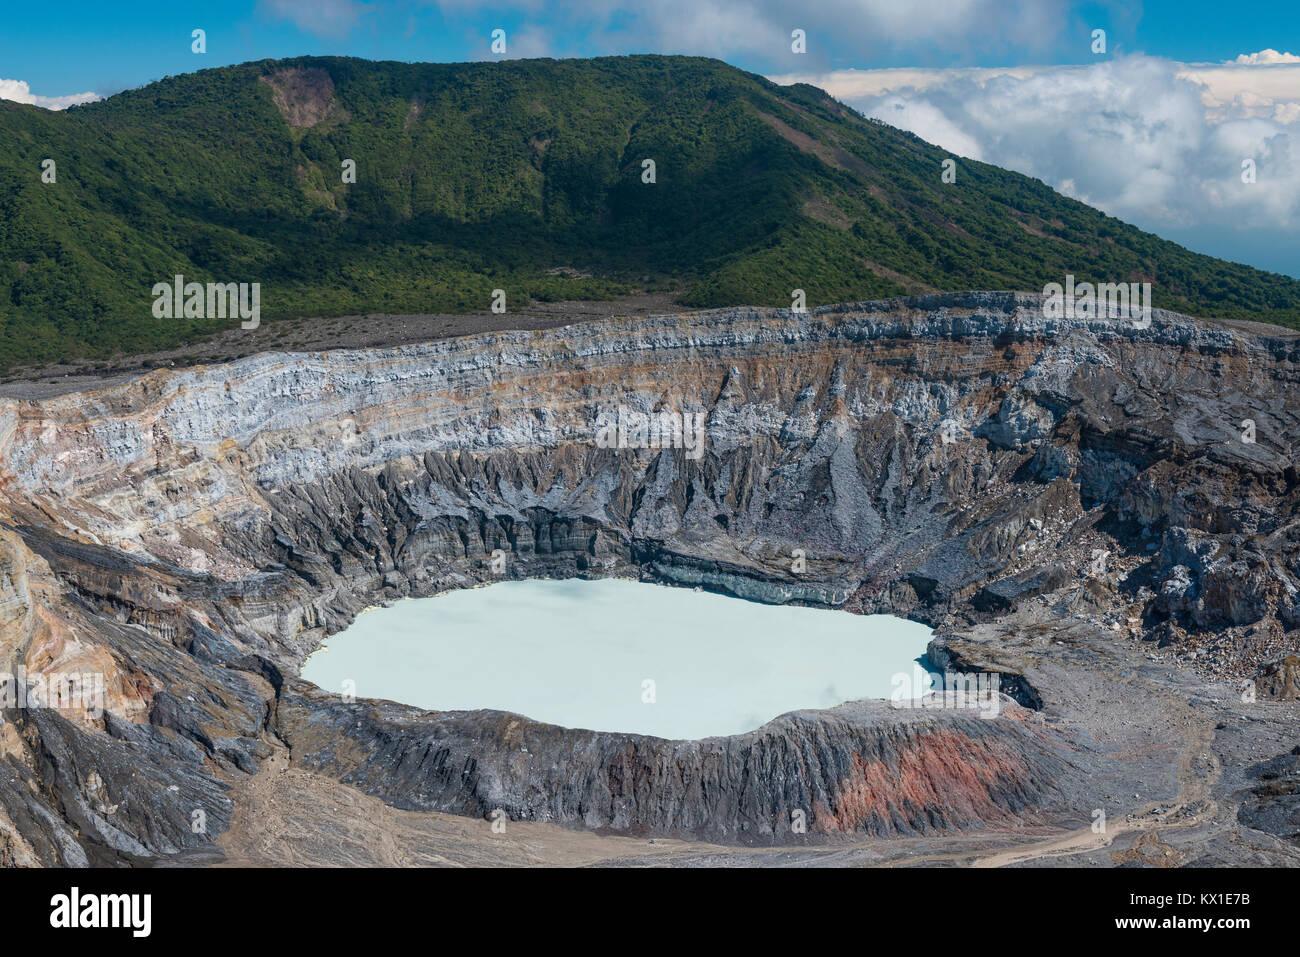 Caldera with crater lake, Poas Volcano, National Park Poas Volcano, Costa Rica - Stock Image